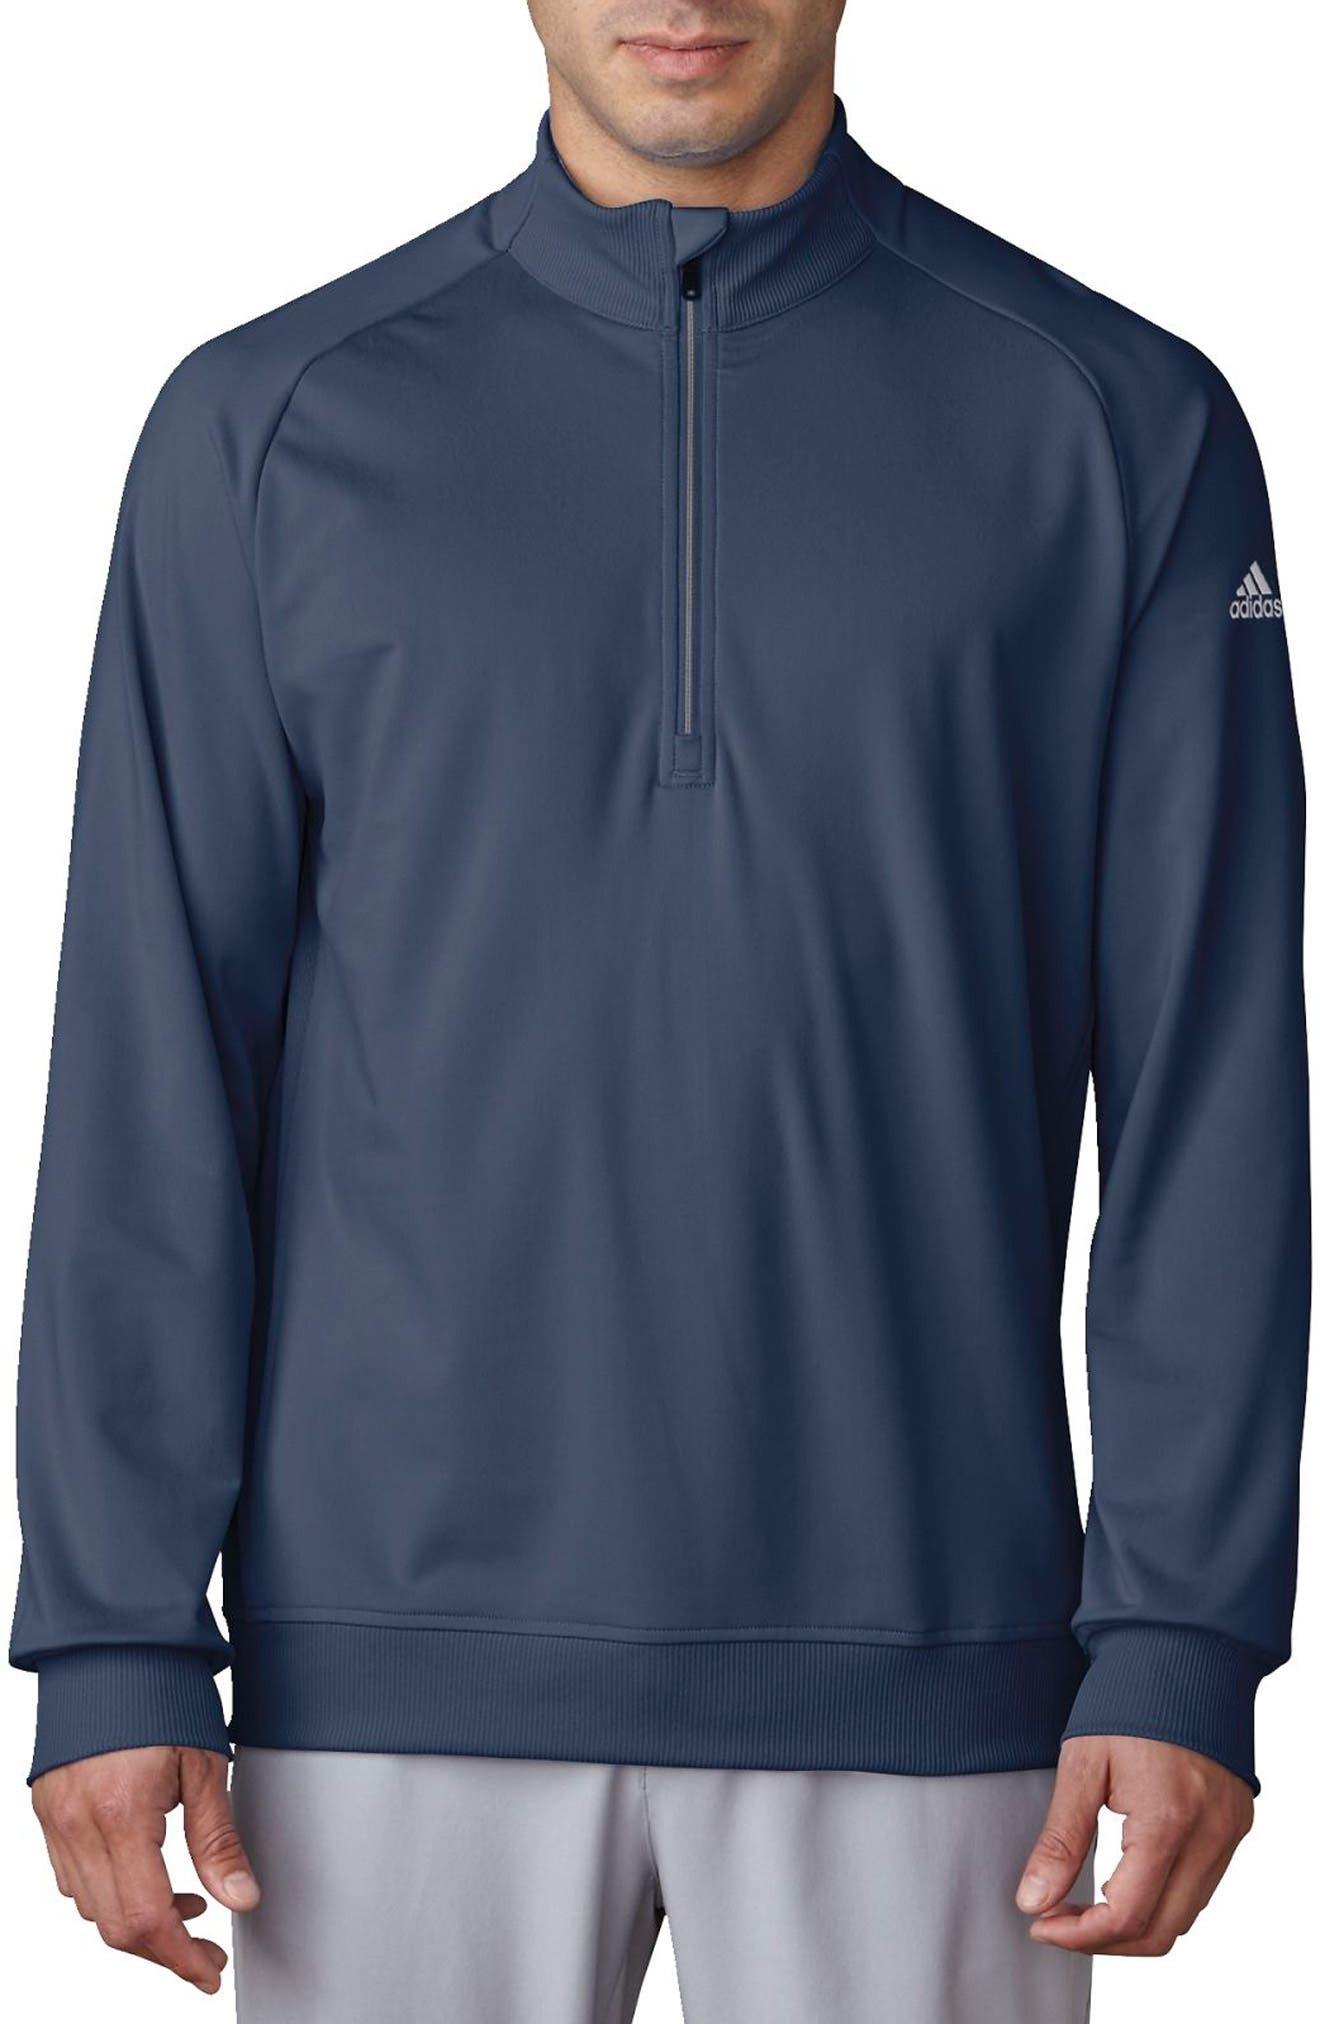 Main Image - adidas Quarter Zip Gold Pullover